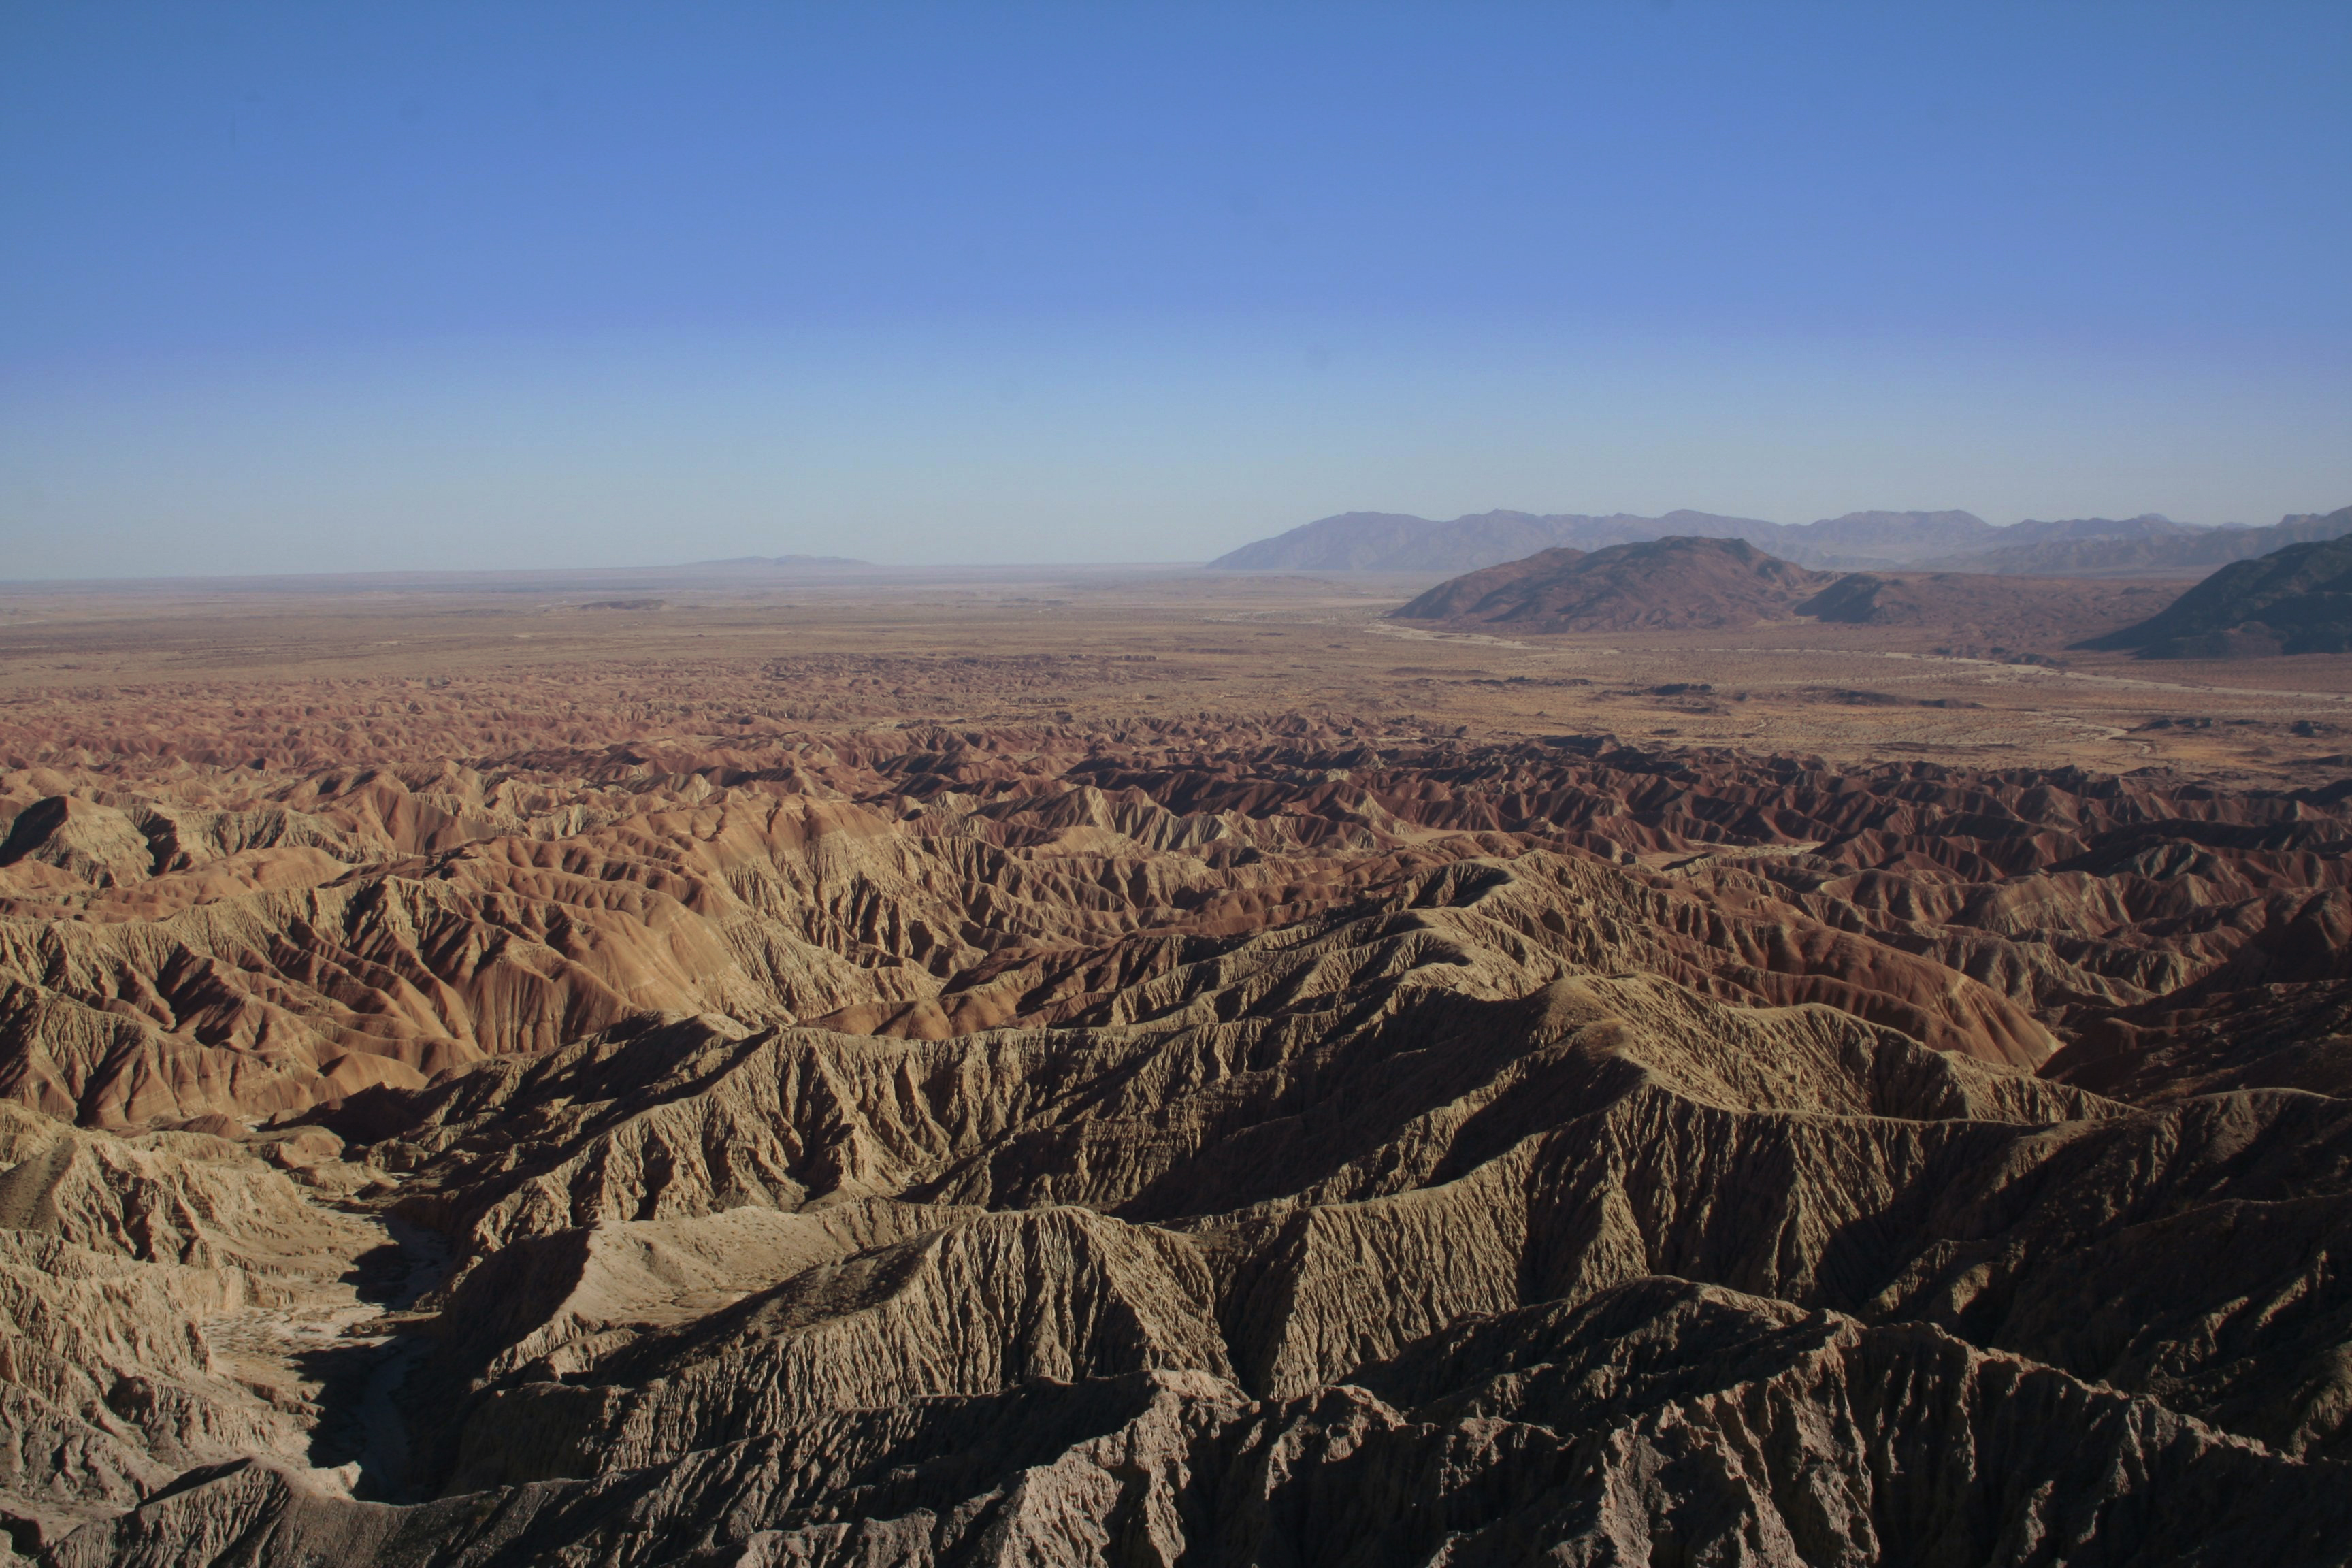 anza borrego desert state park wikiwand